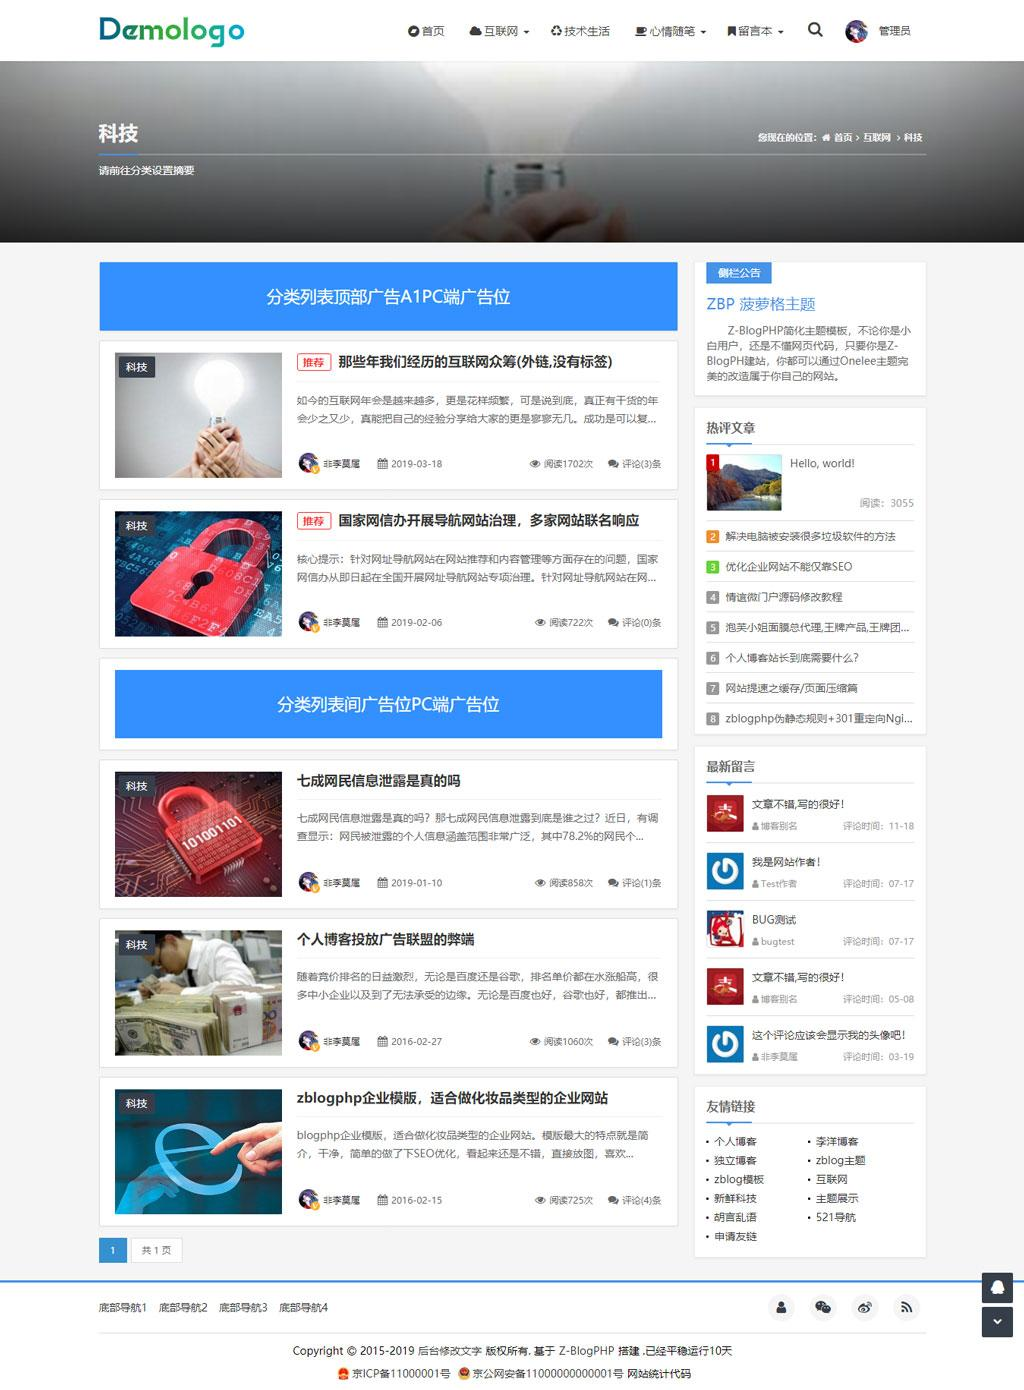 Z-blogPHP《小清新》至简至美个人博客主题模板,自适应加SEO优化,Z-blogPHP《小清新》至简至美个人博客主题模板,自适应加SEO优化 第8张,免费,php,模板,QQ,公告,seo,第9张